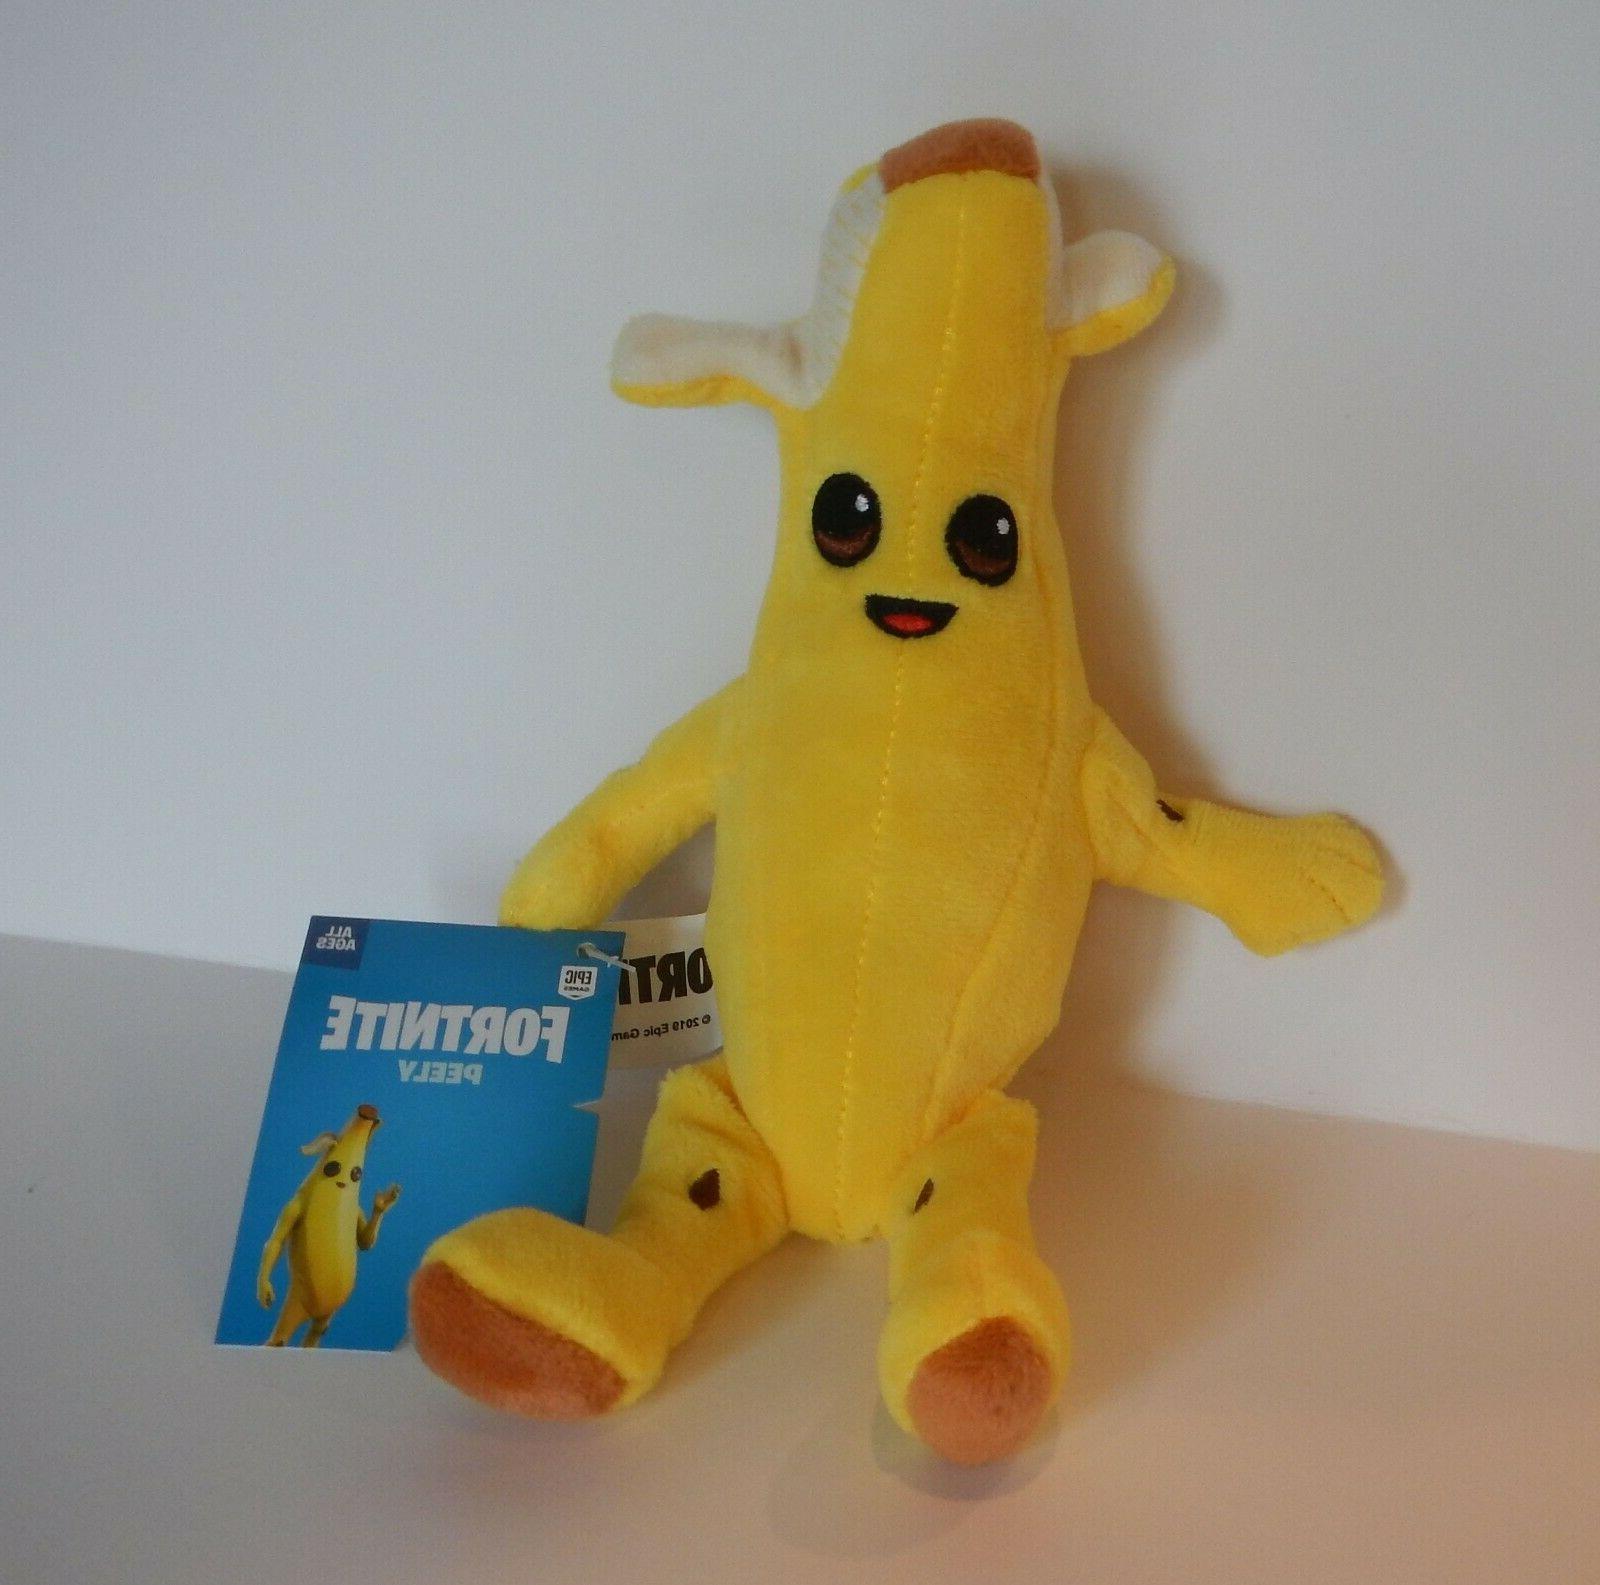 fortnite peely nana banana plush 8 inch